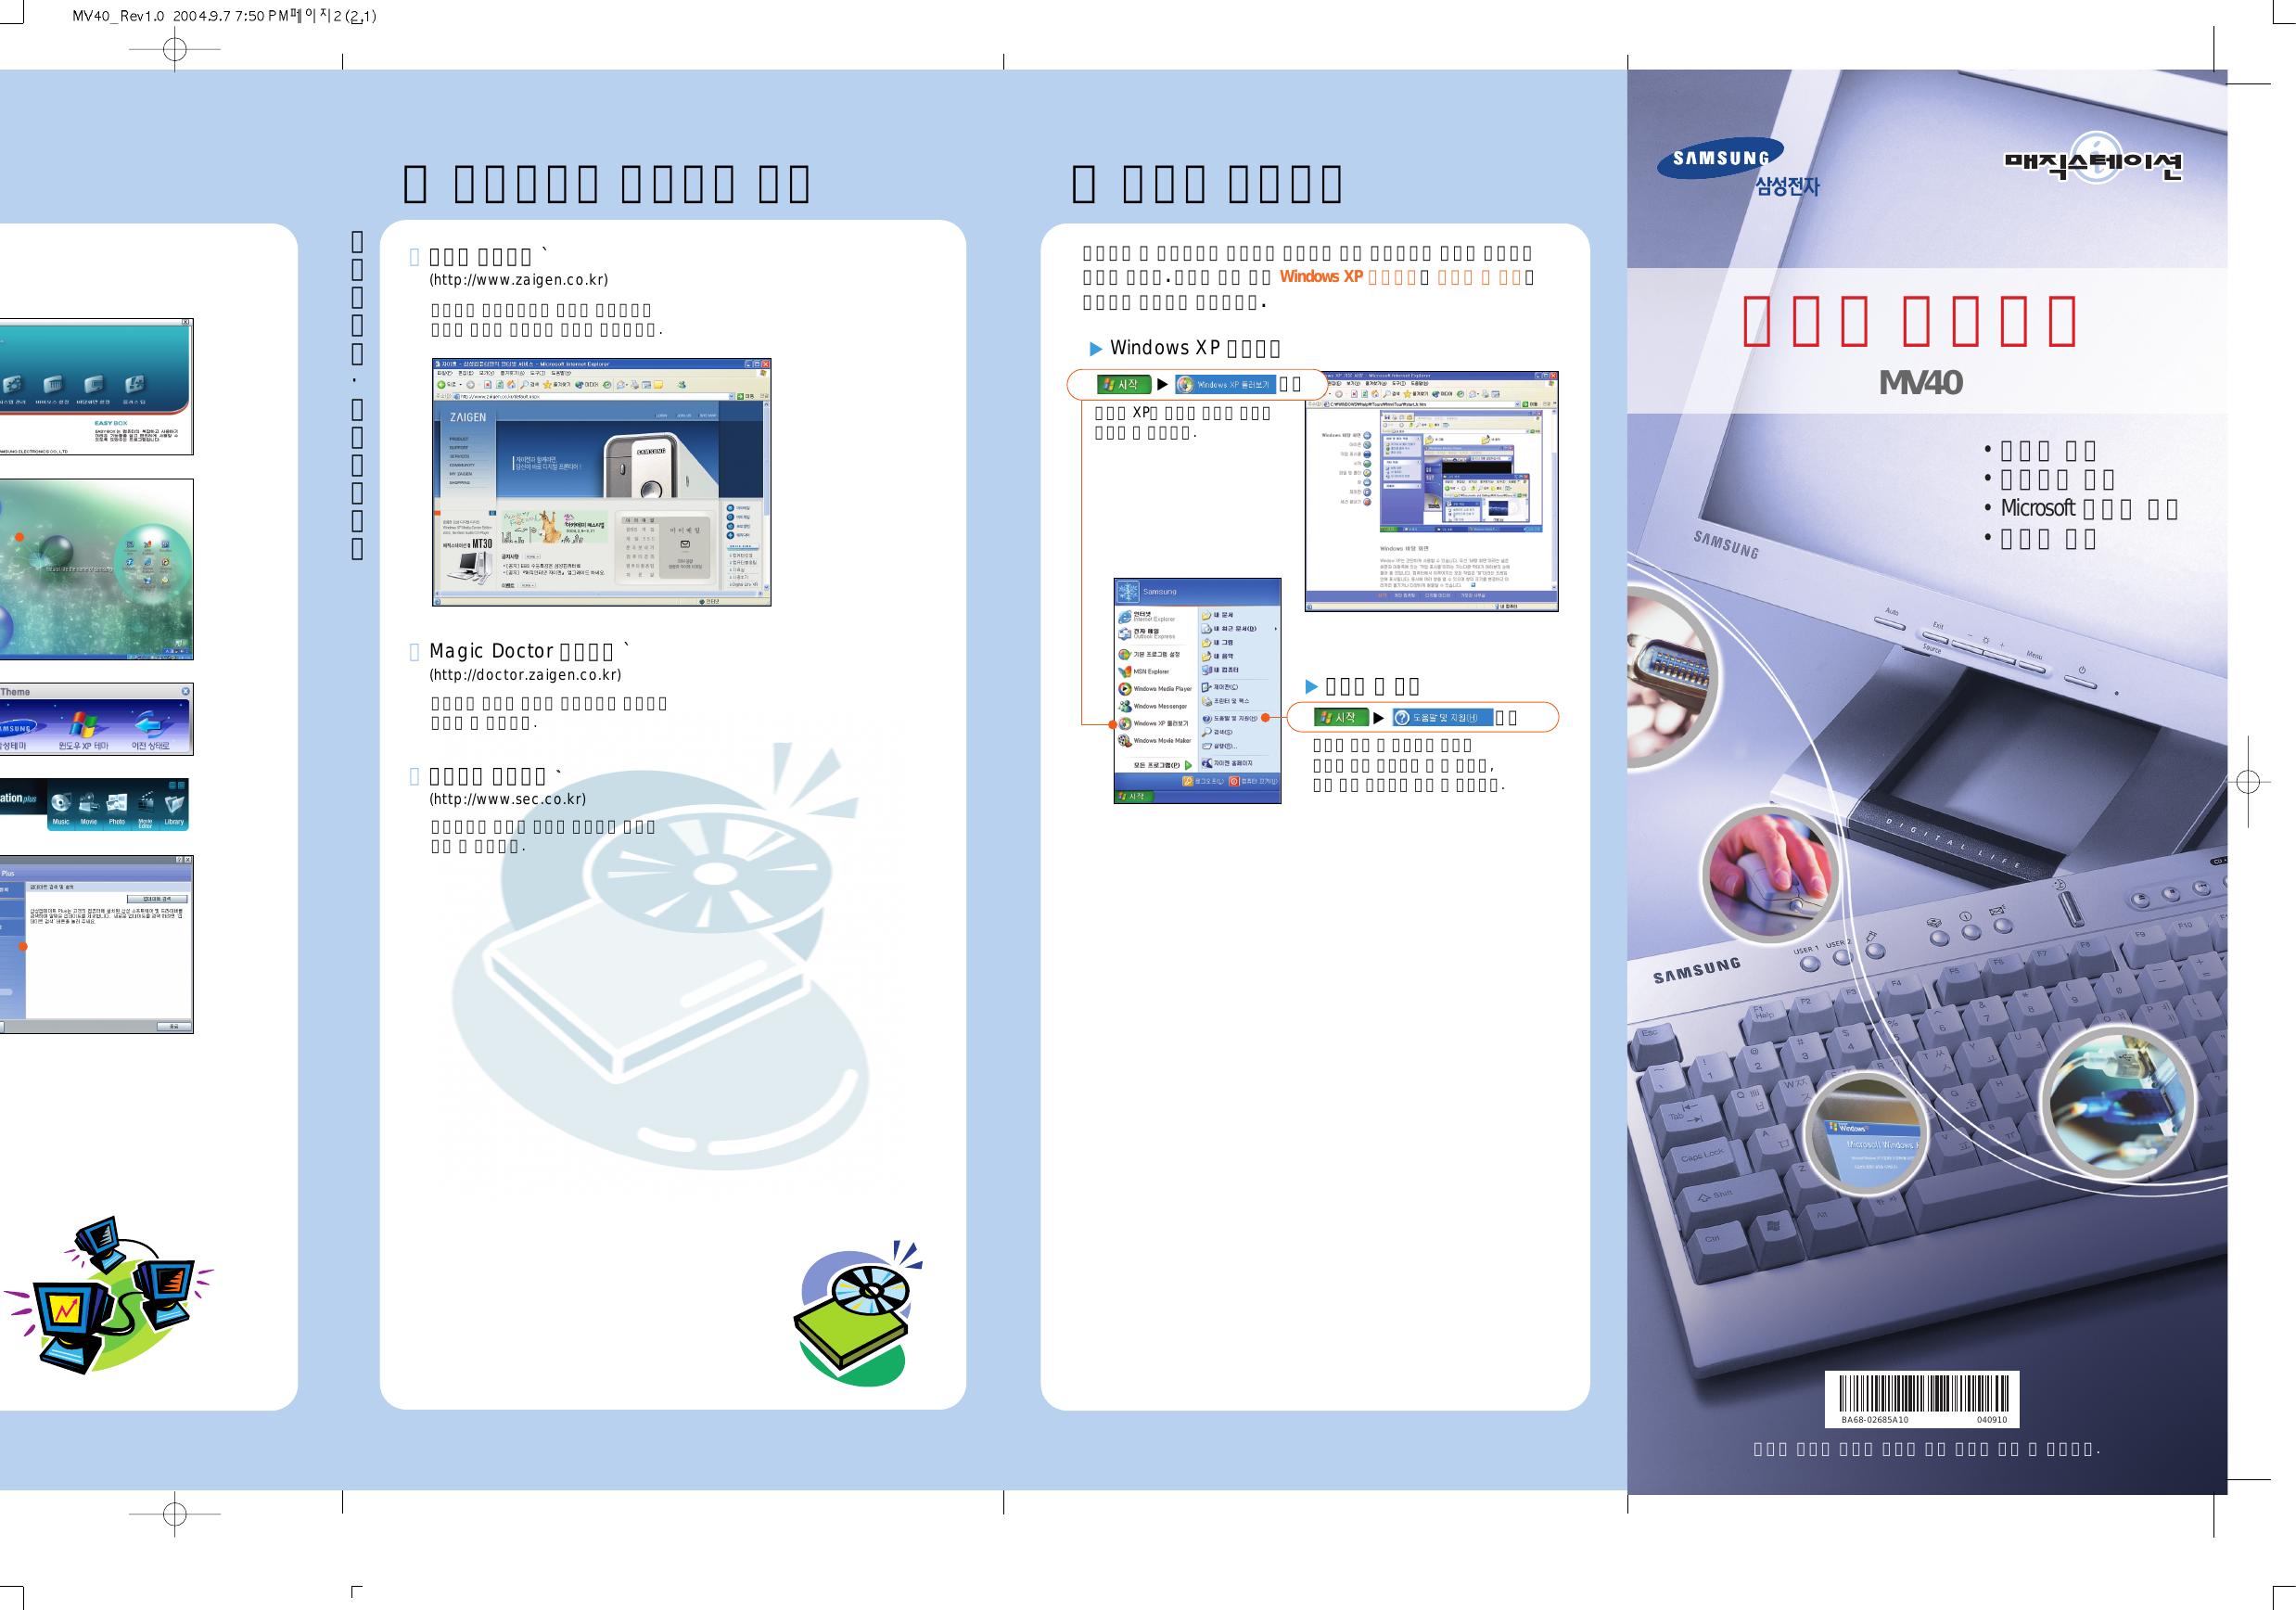 Panasonic dp 1820e driver windows 10 softrusbestsoft.